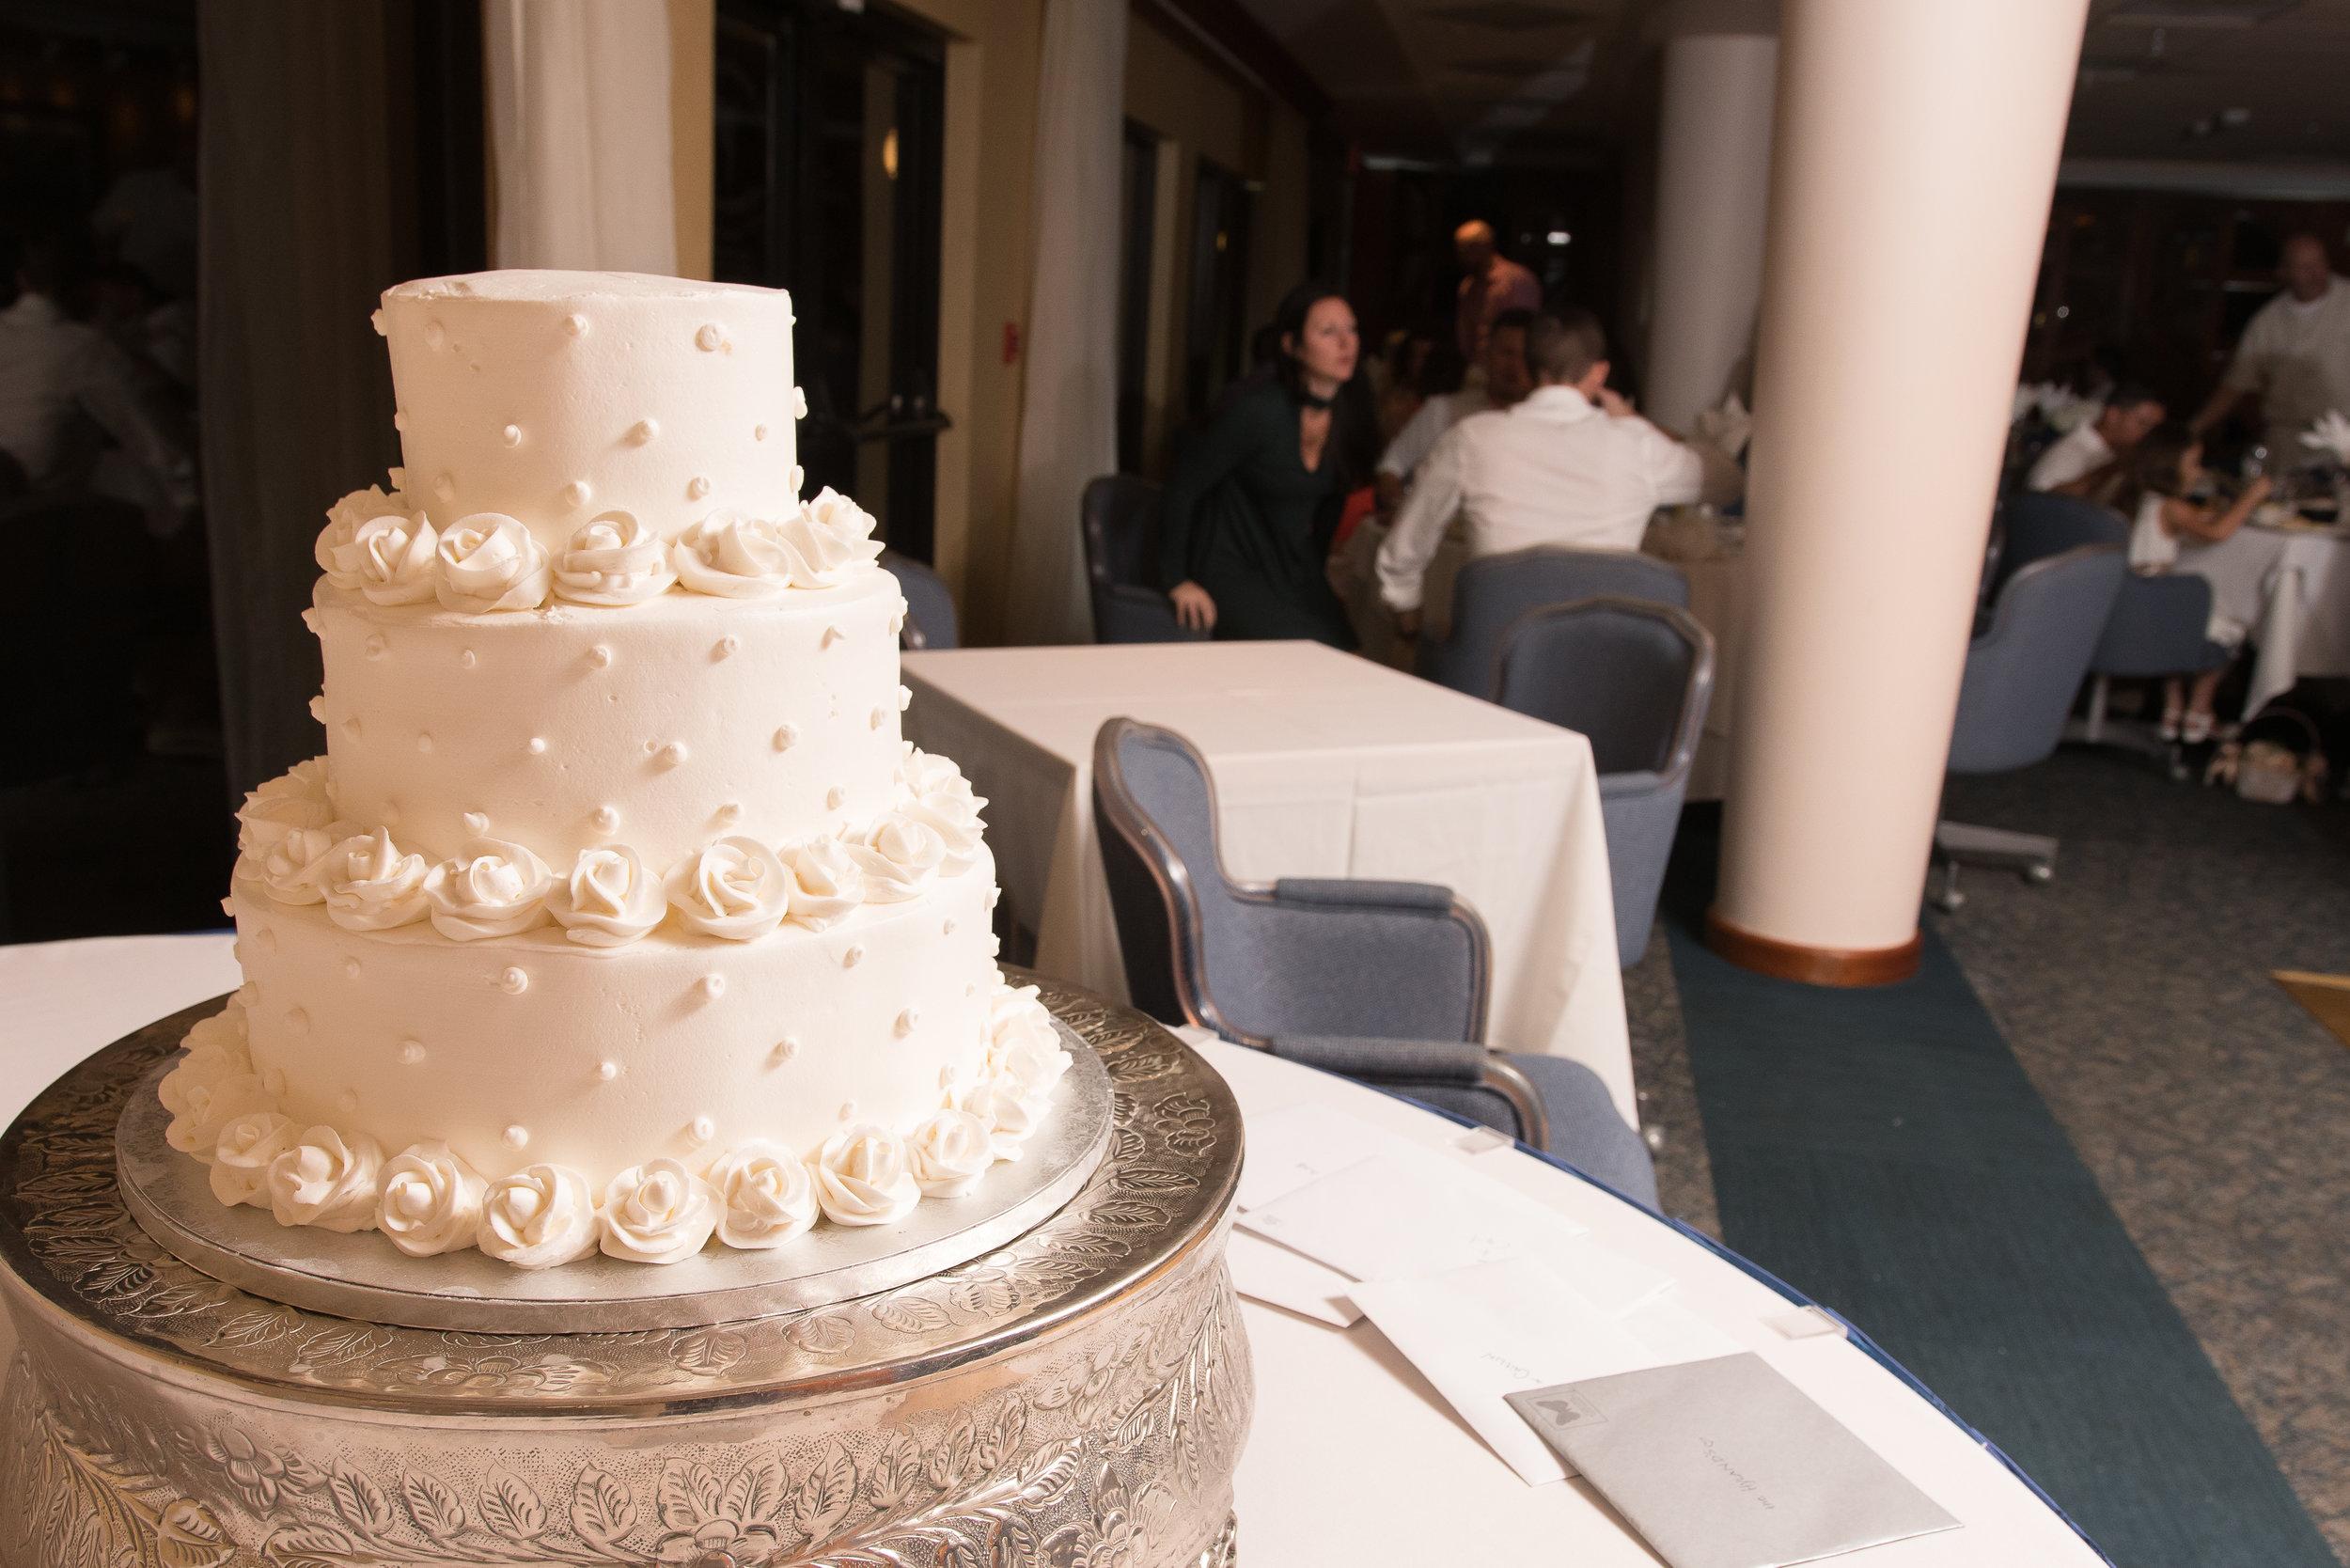 St.Petersburg wedding photographer, St.Pete wedding, Beach wedding, Beach wedding photographer, Tampa wedding photographer, Mir Salgado Photography, wedding cake